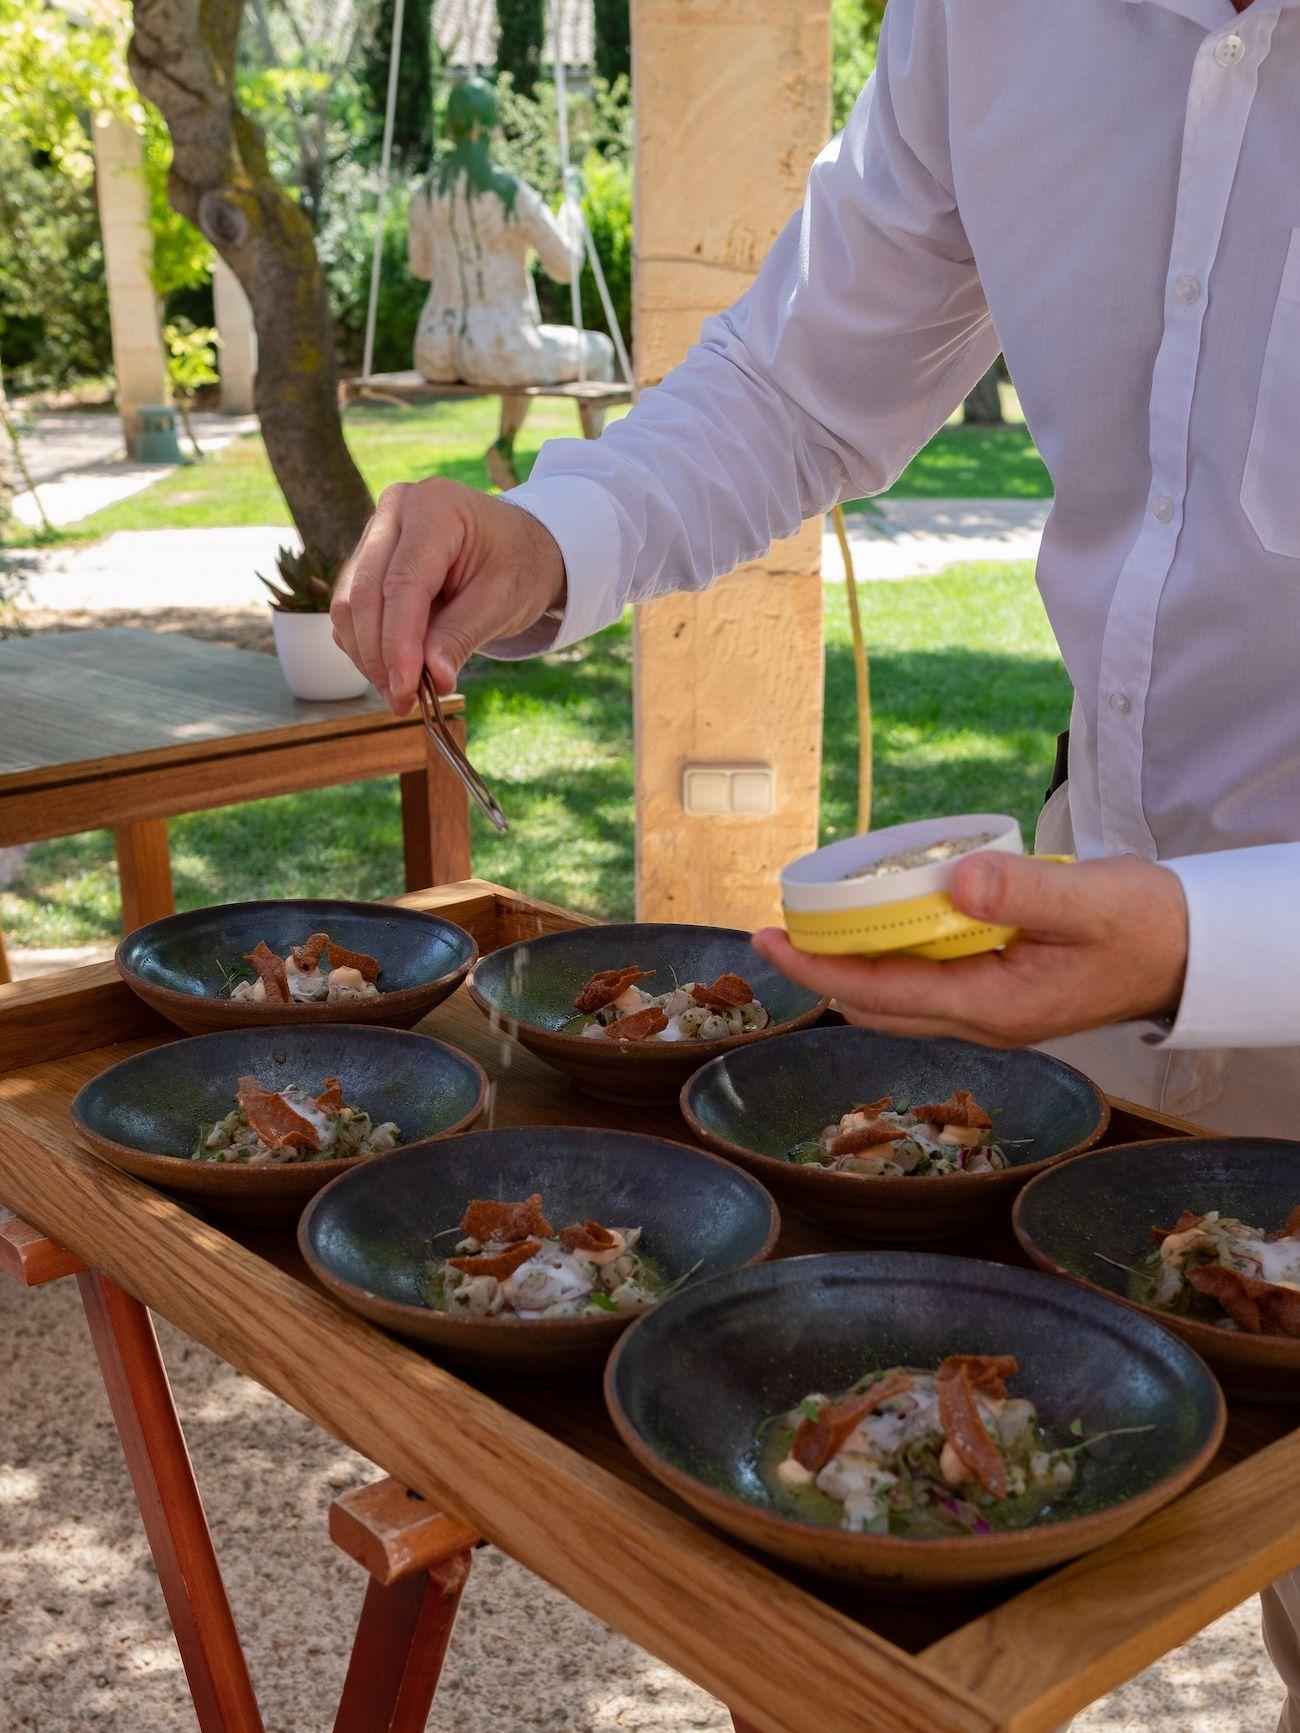 About Fuel, Foodblog, Leckerbissen, Flor de Sal D'es Trenc, Fontsanta, Ceviche